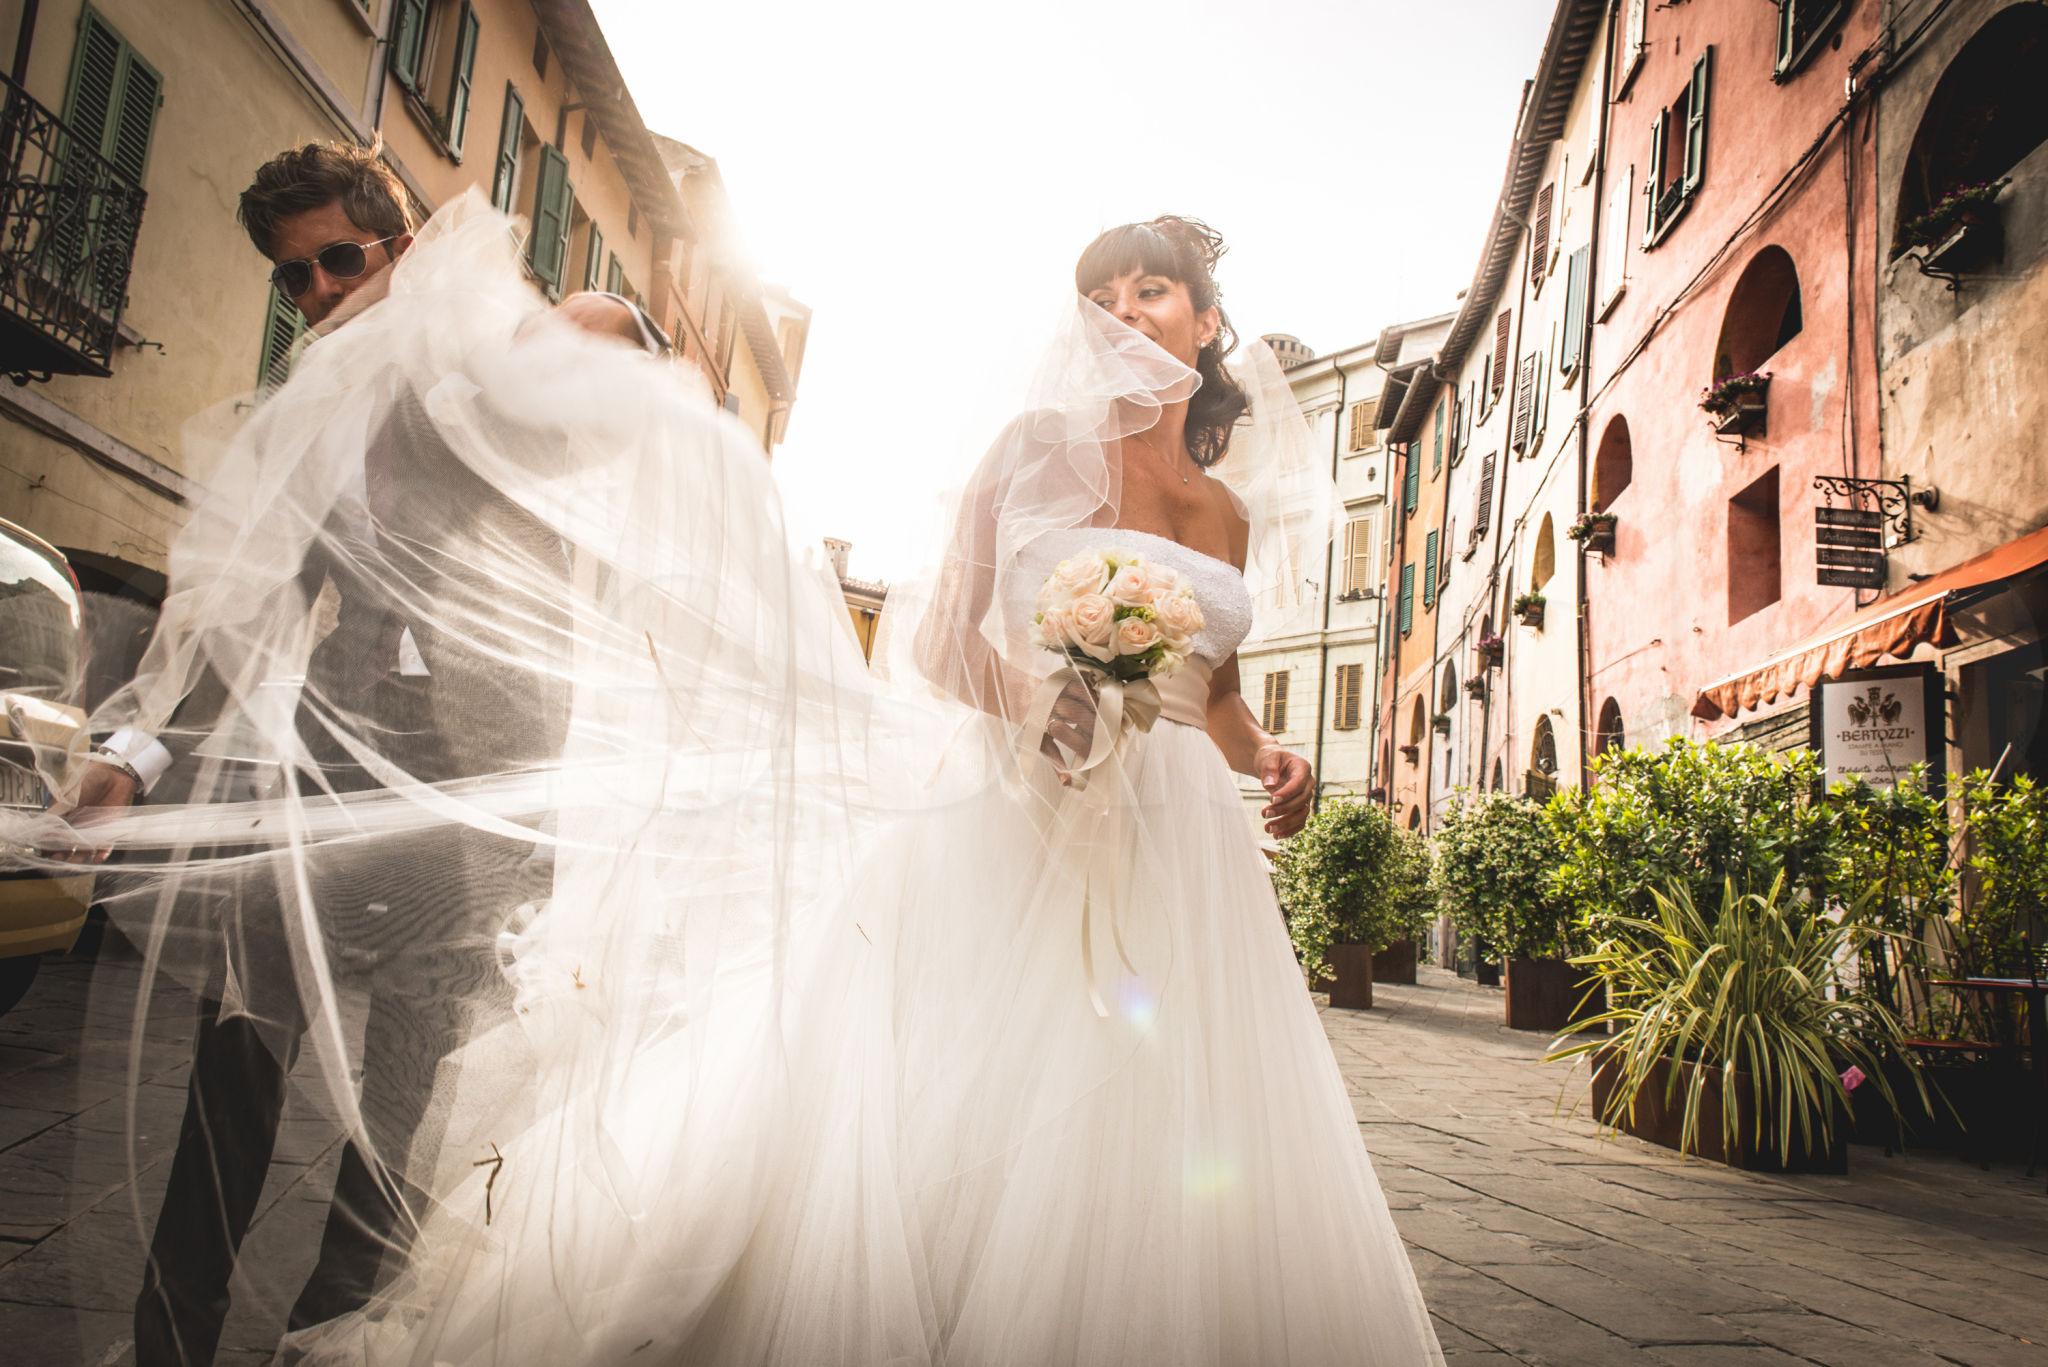 http://lnx.mirkone.it/wp-content/uploads/2015/07/fotografo-matrimoni-faenza-0021.jpg